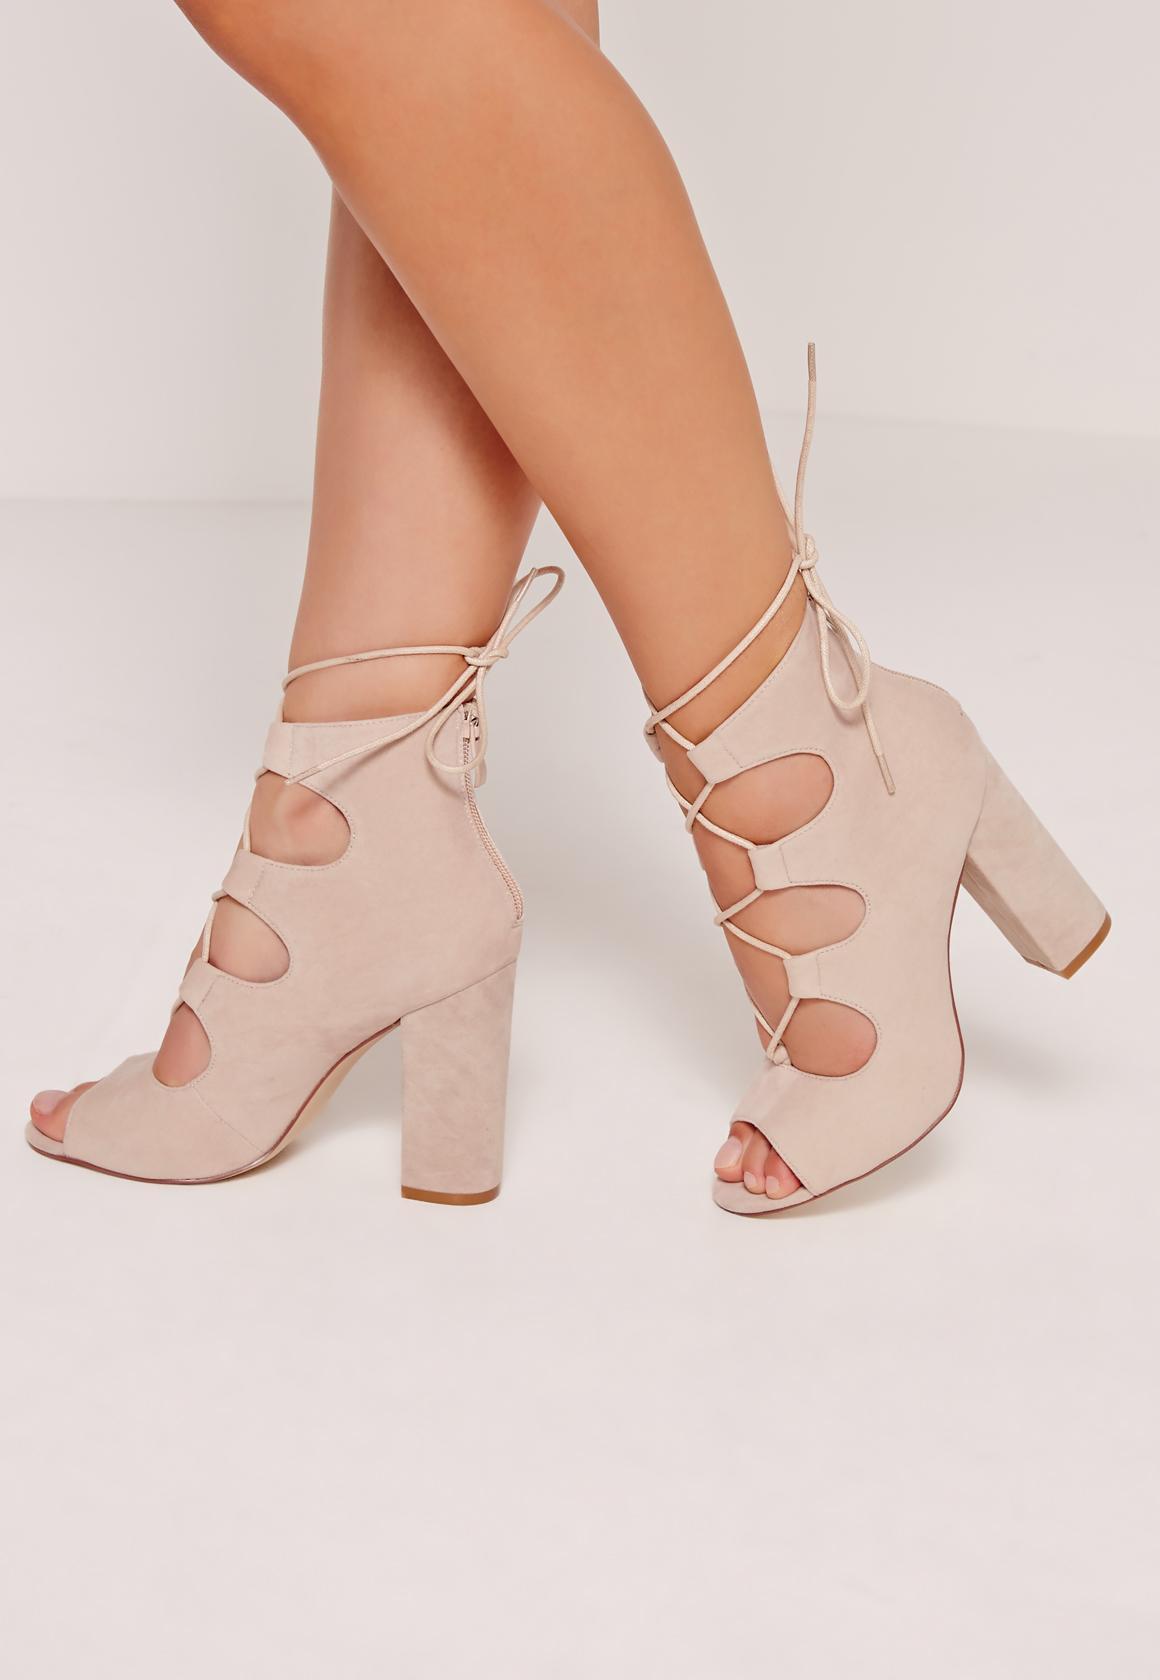 Lace Up Peep Toe Block Heels Nude